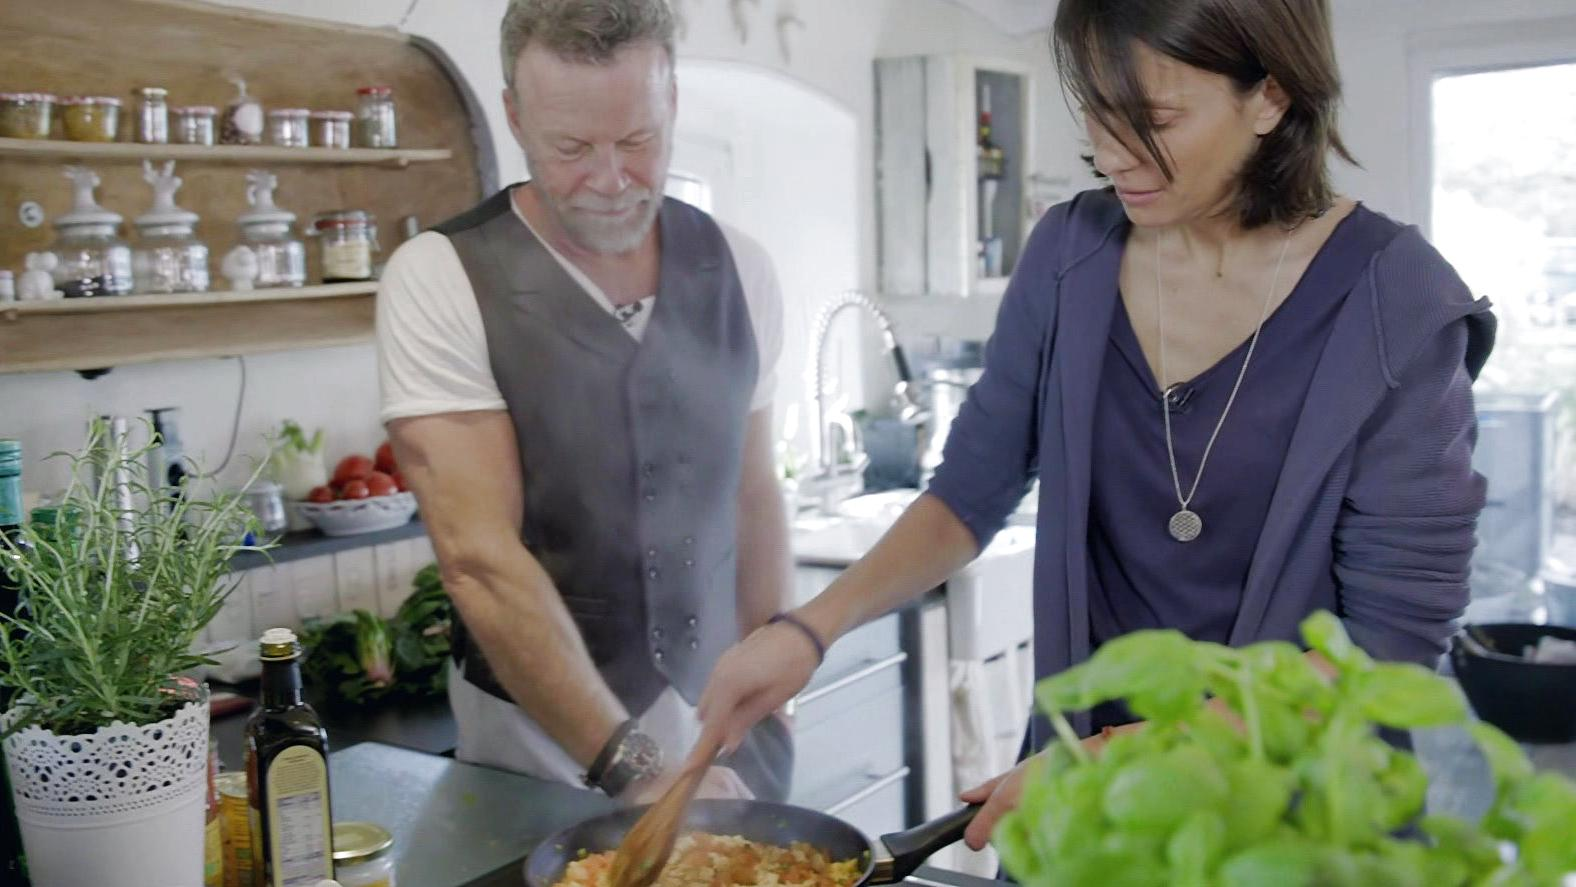 die-rezepte-zum-nachkochen-veganes-menu-aus-dem-jenke-experiment